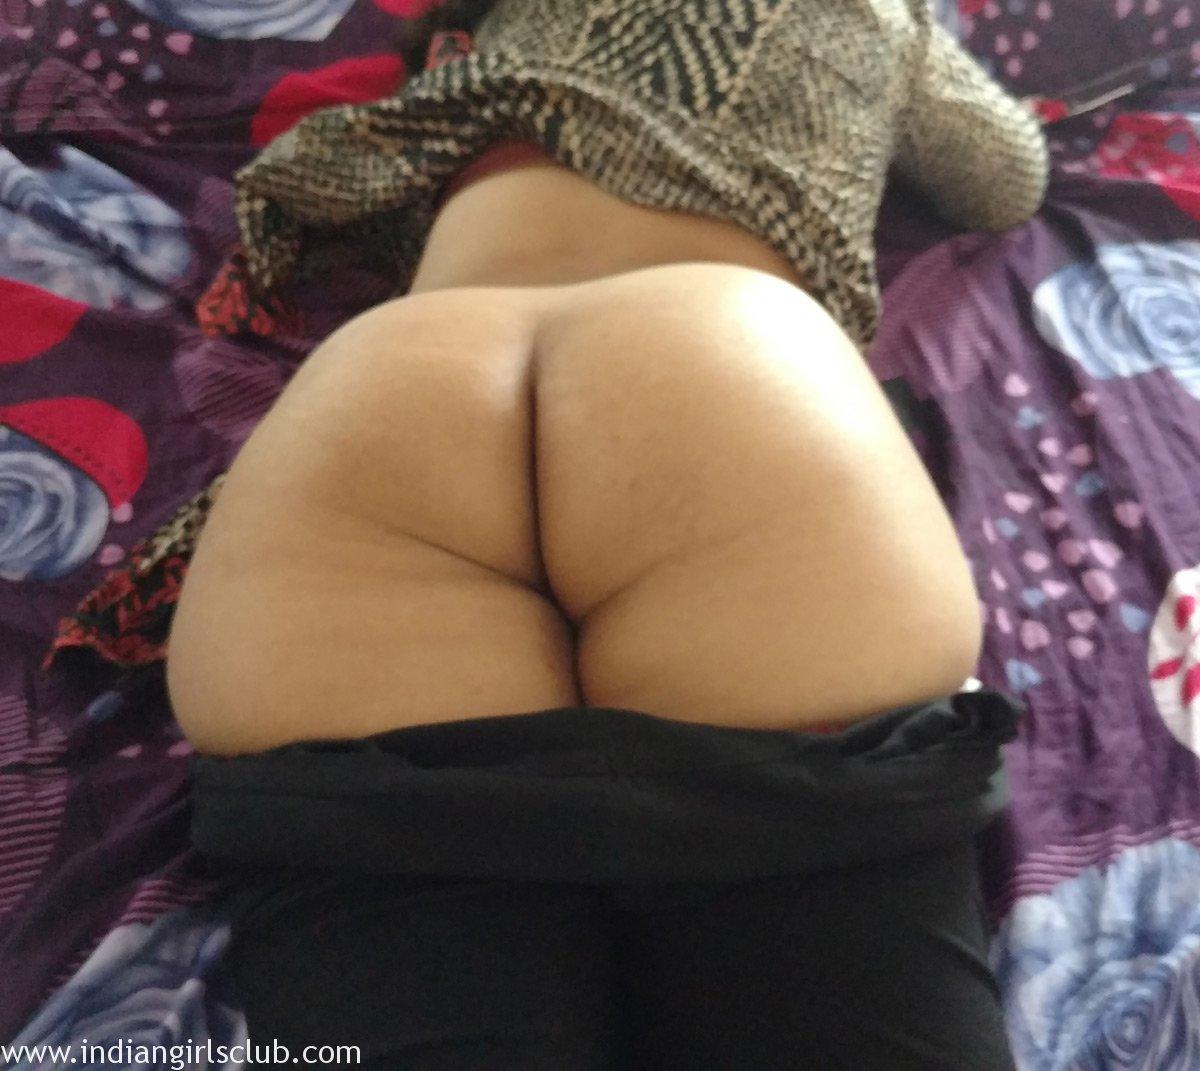 Big ass indian showing porn images